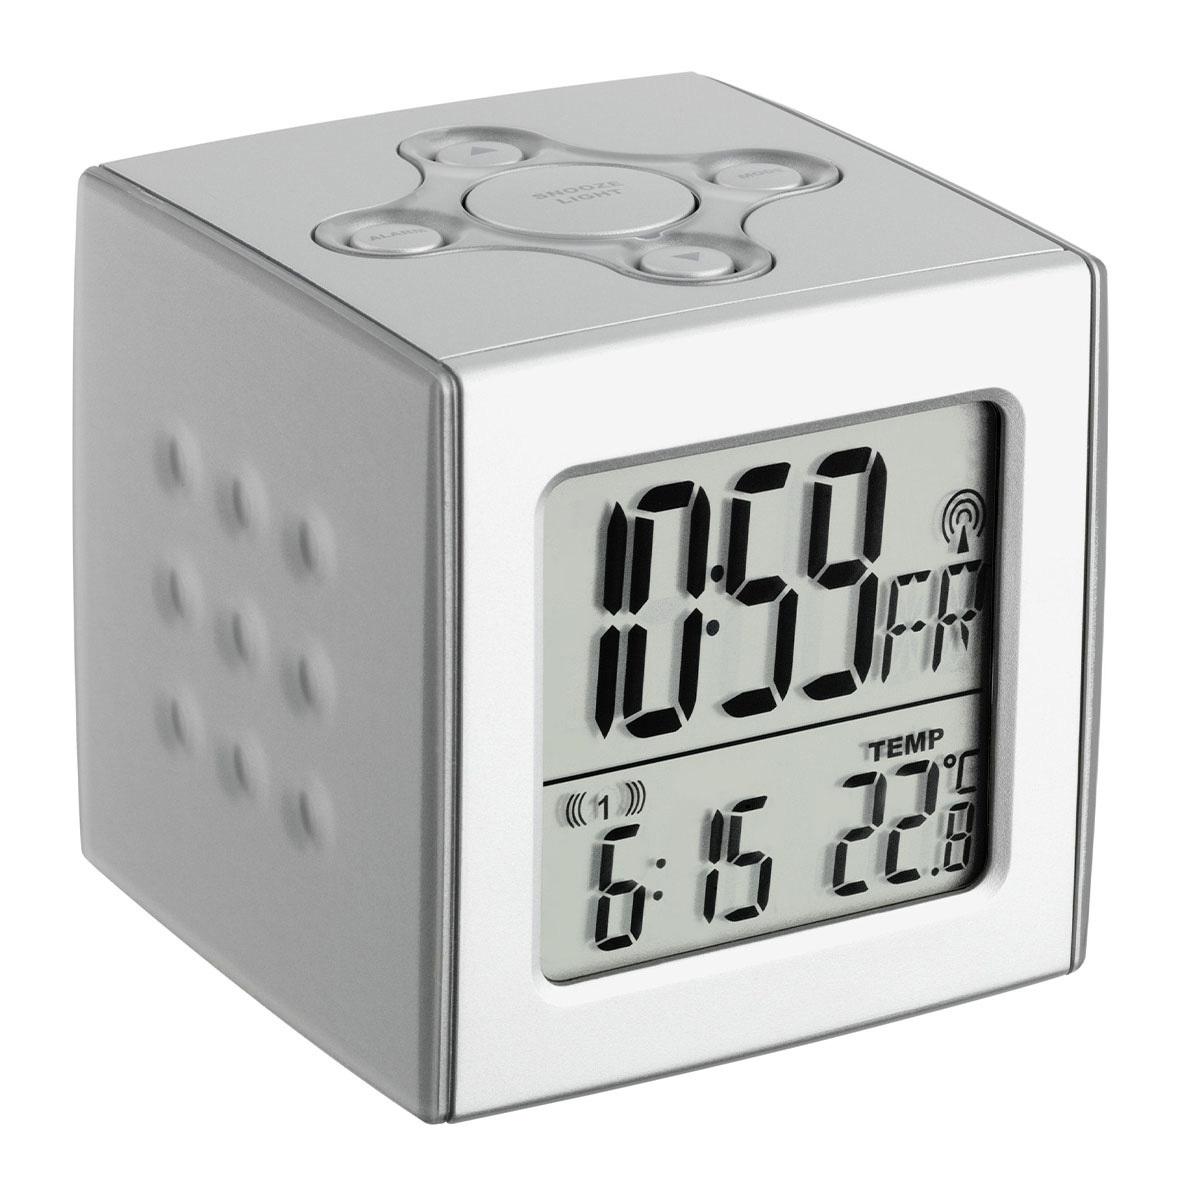 60-2517-digitaler-funk-wecker-mit-temperatur-cubo-1200x1200px.jpg